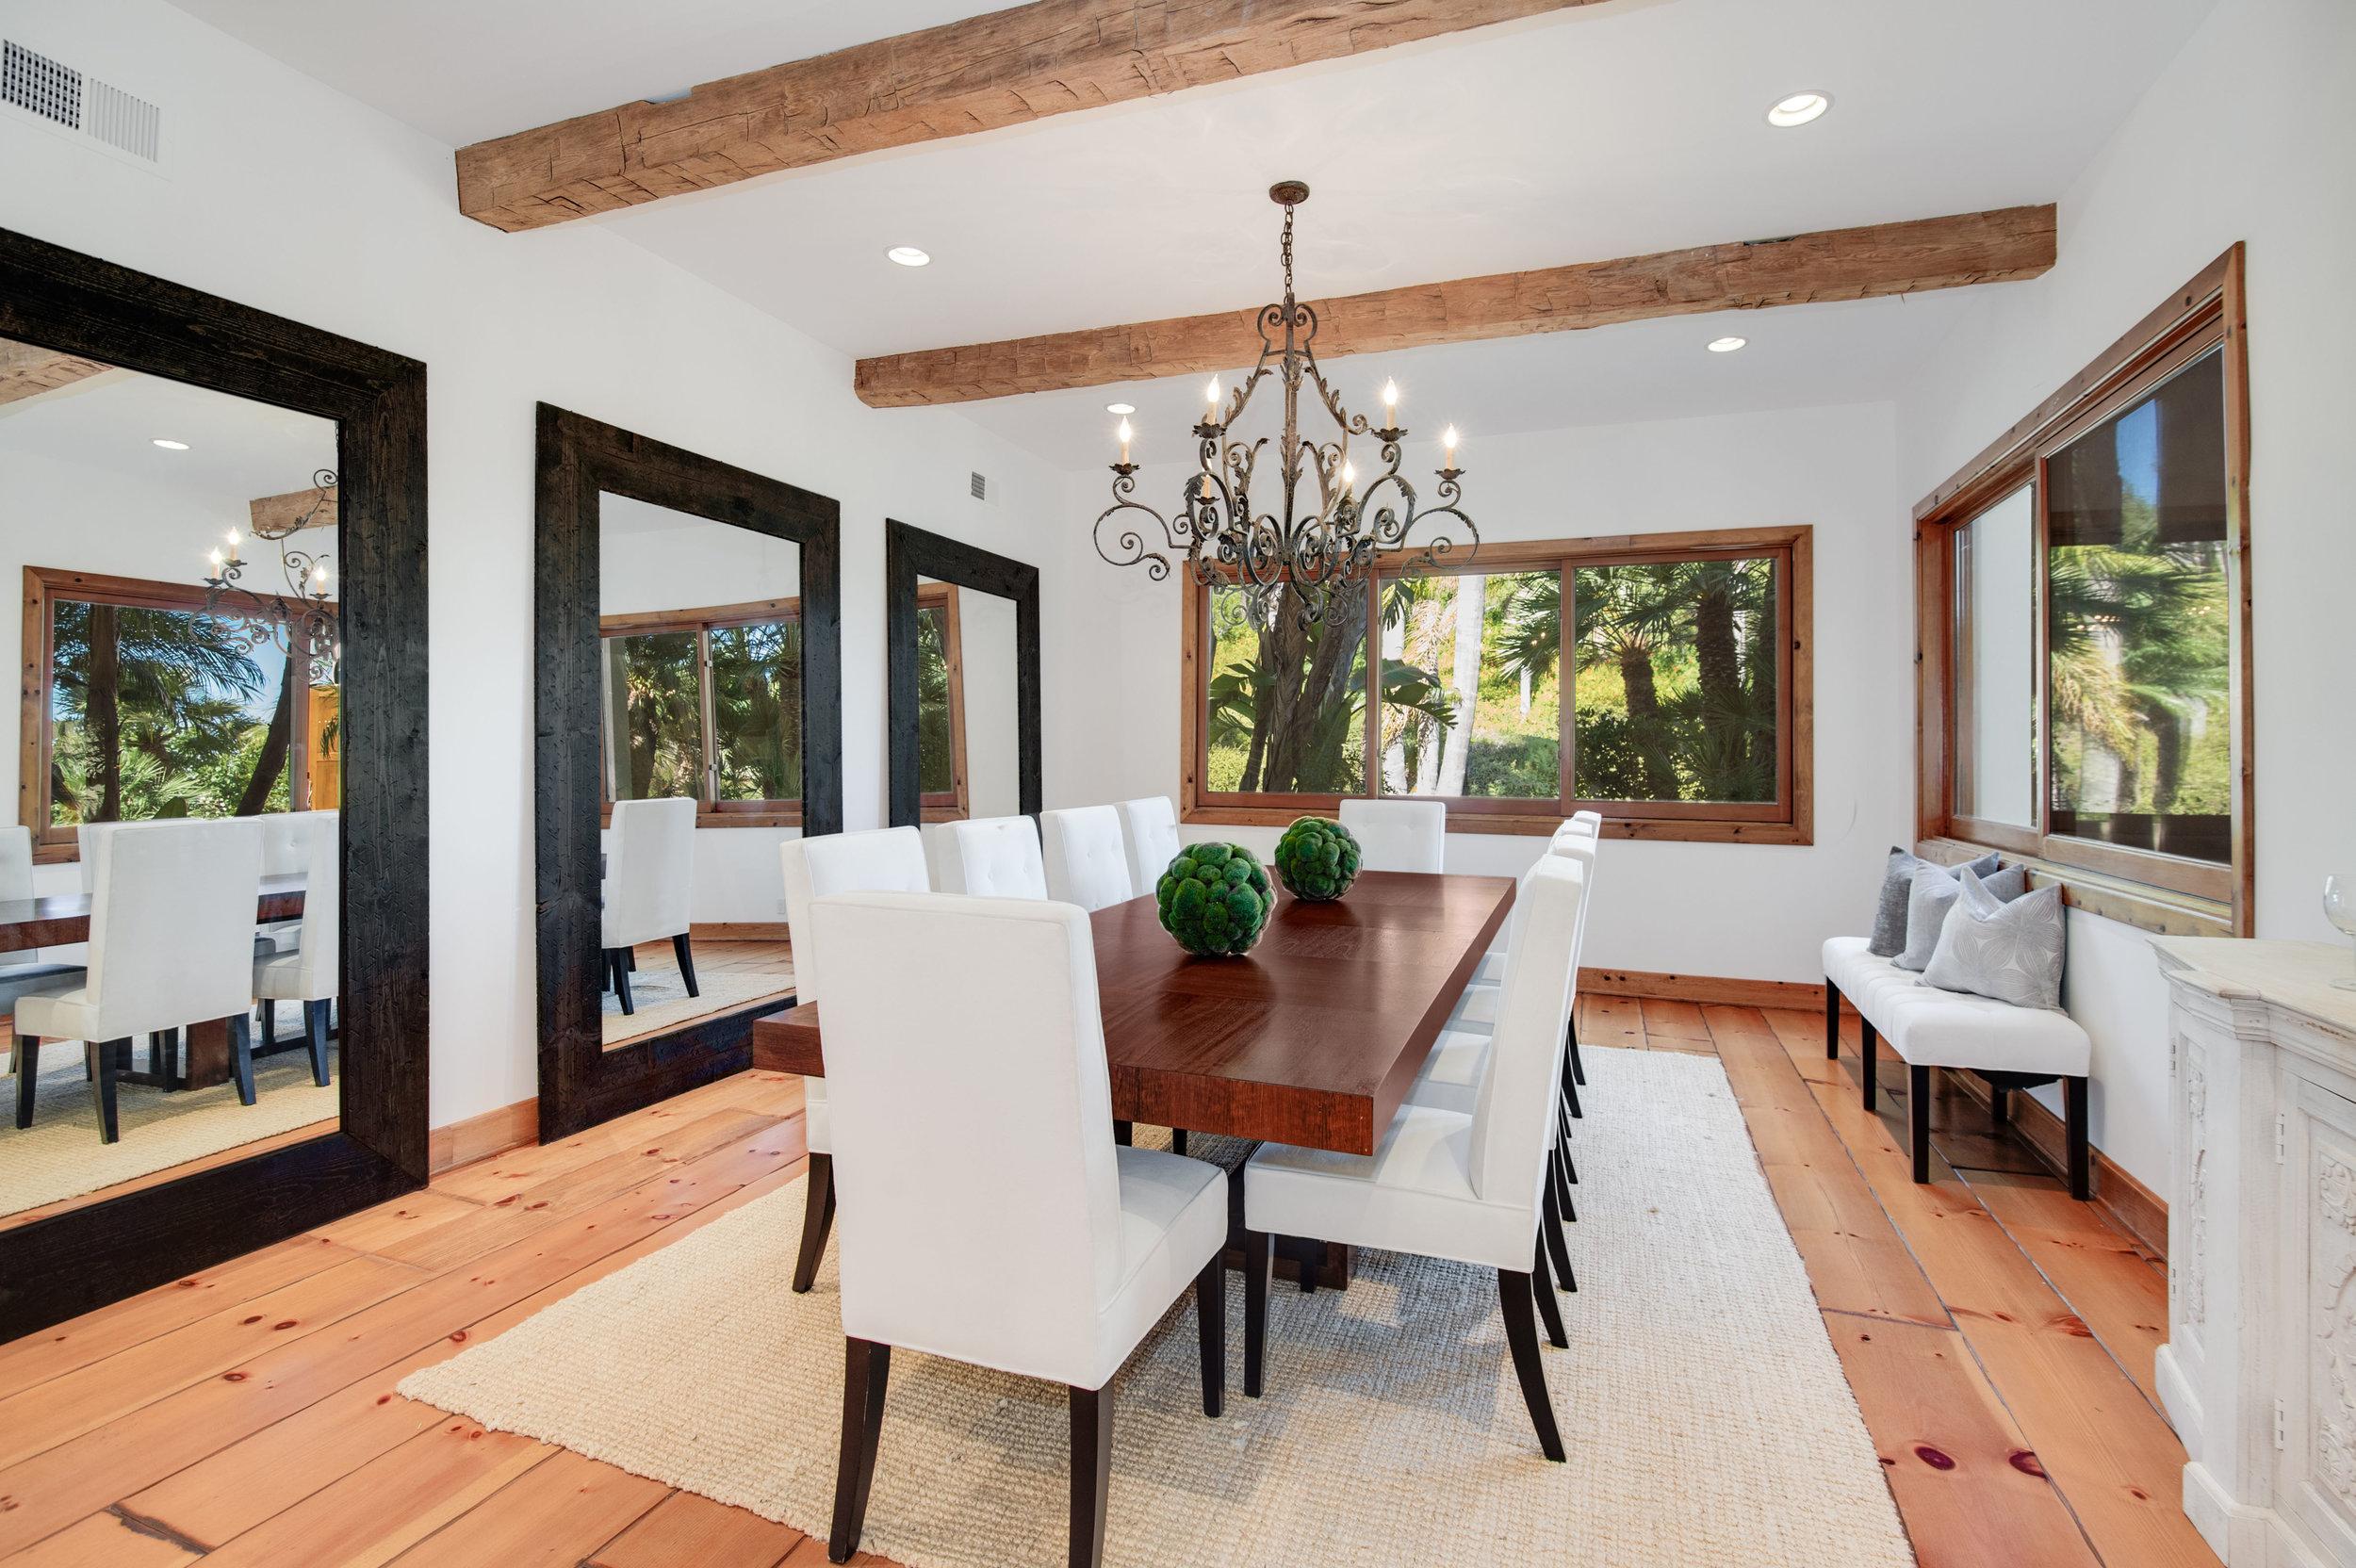 011 Dining Room 27475 Latigo Bay View Drive For Sale Lease The Malibu Life Team Luxury Real Estate.jpg